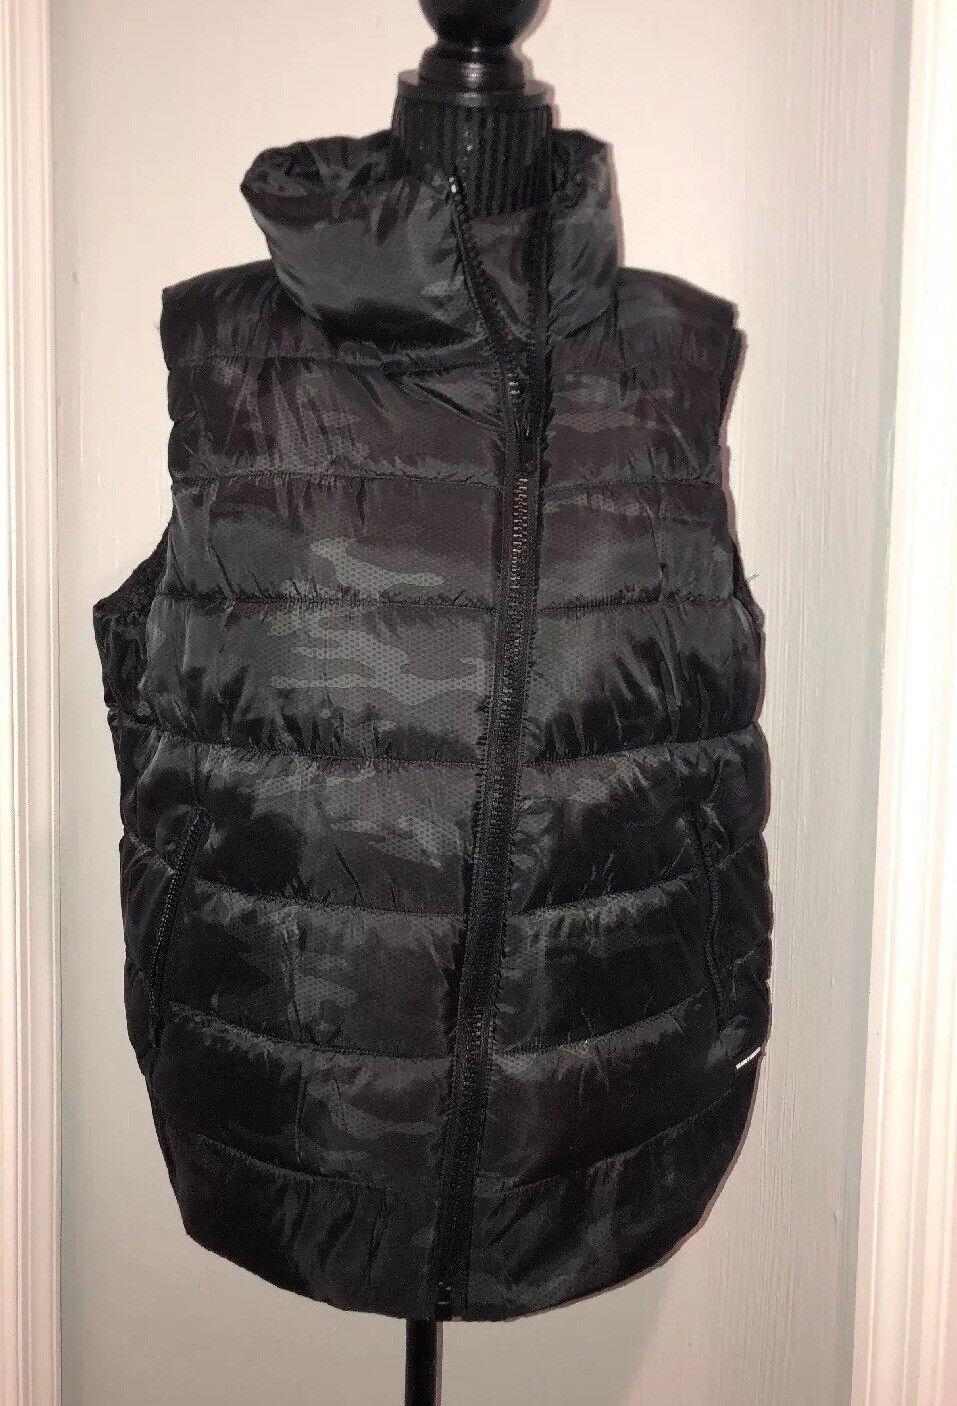 DKNY Water repellent Camo Puffer Vest Vest Vest NWT Size L a03a8a